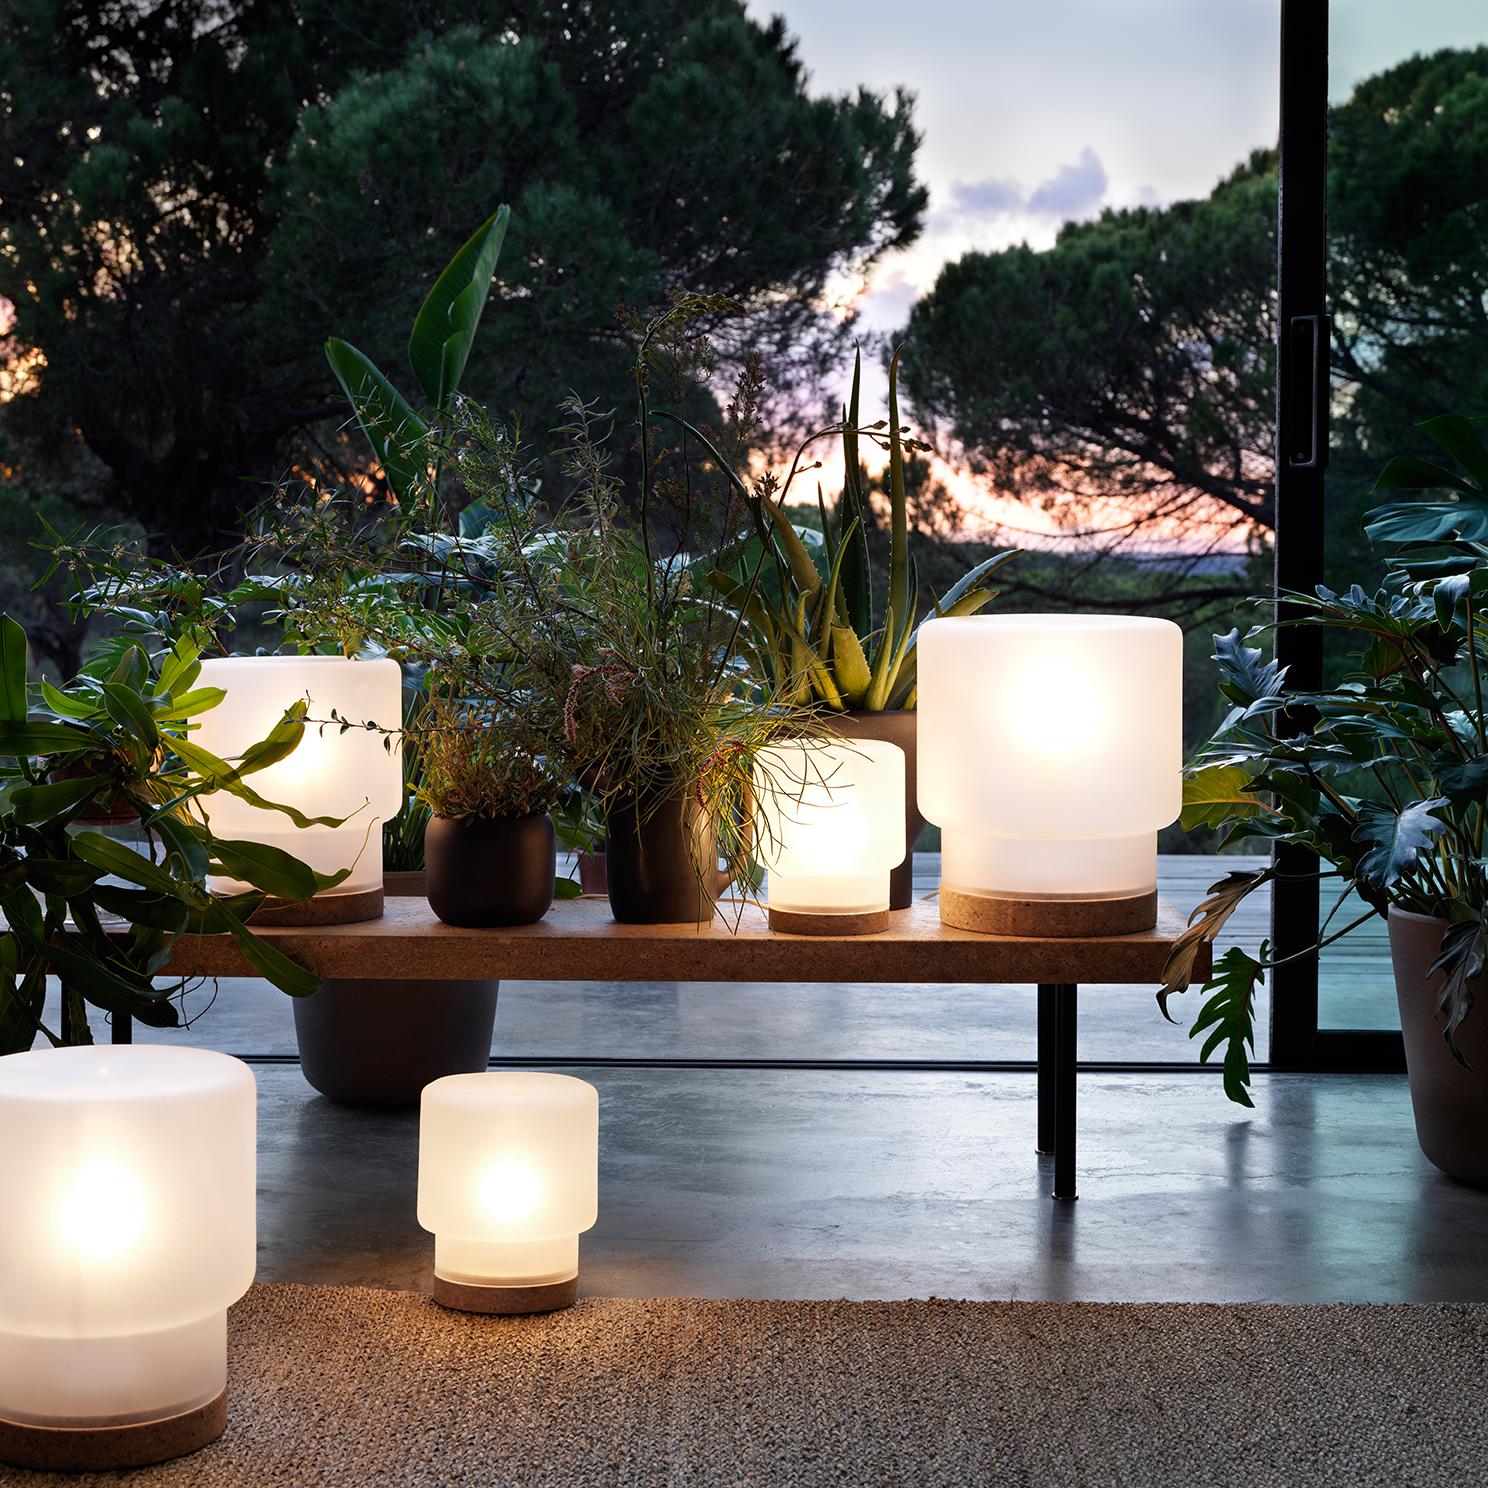 Colección Sinnerlig de Ikea lámparas